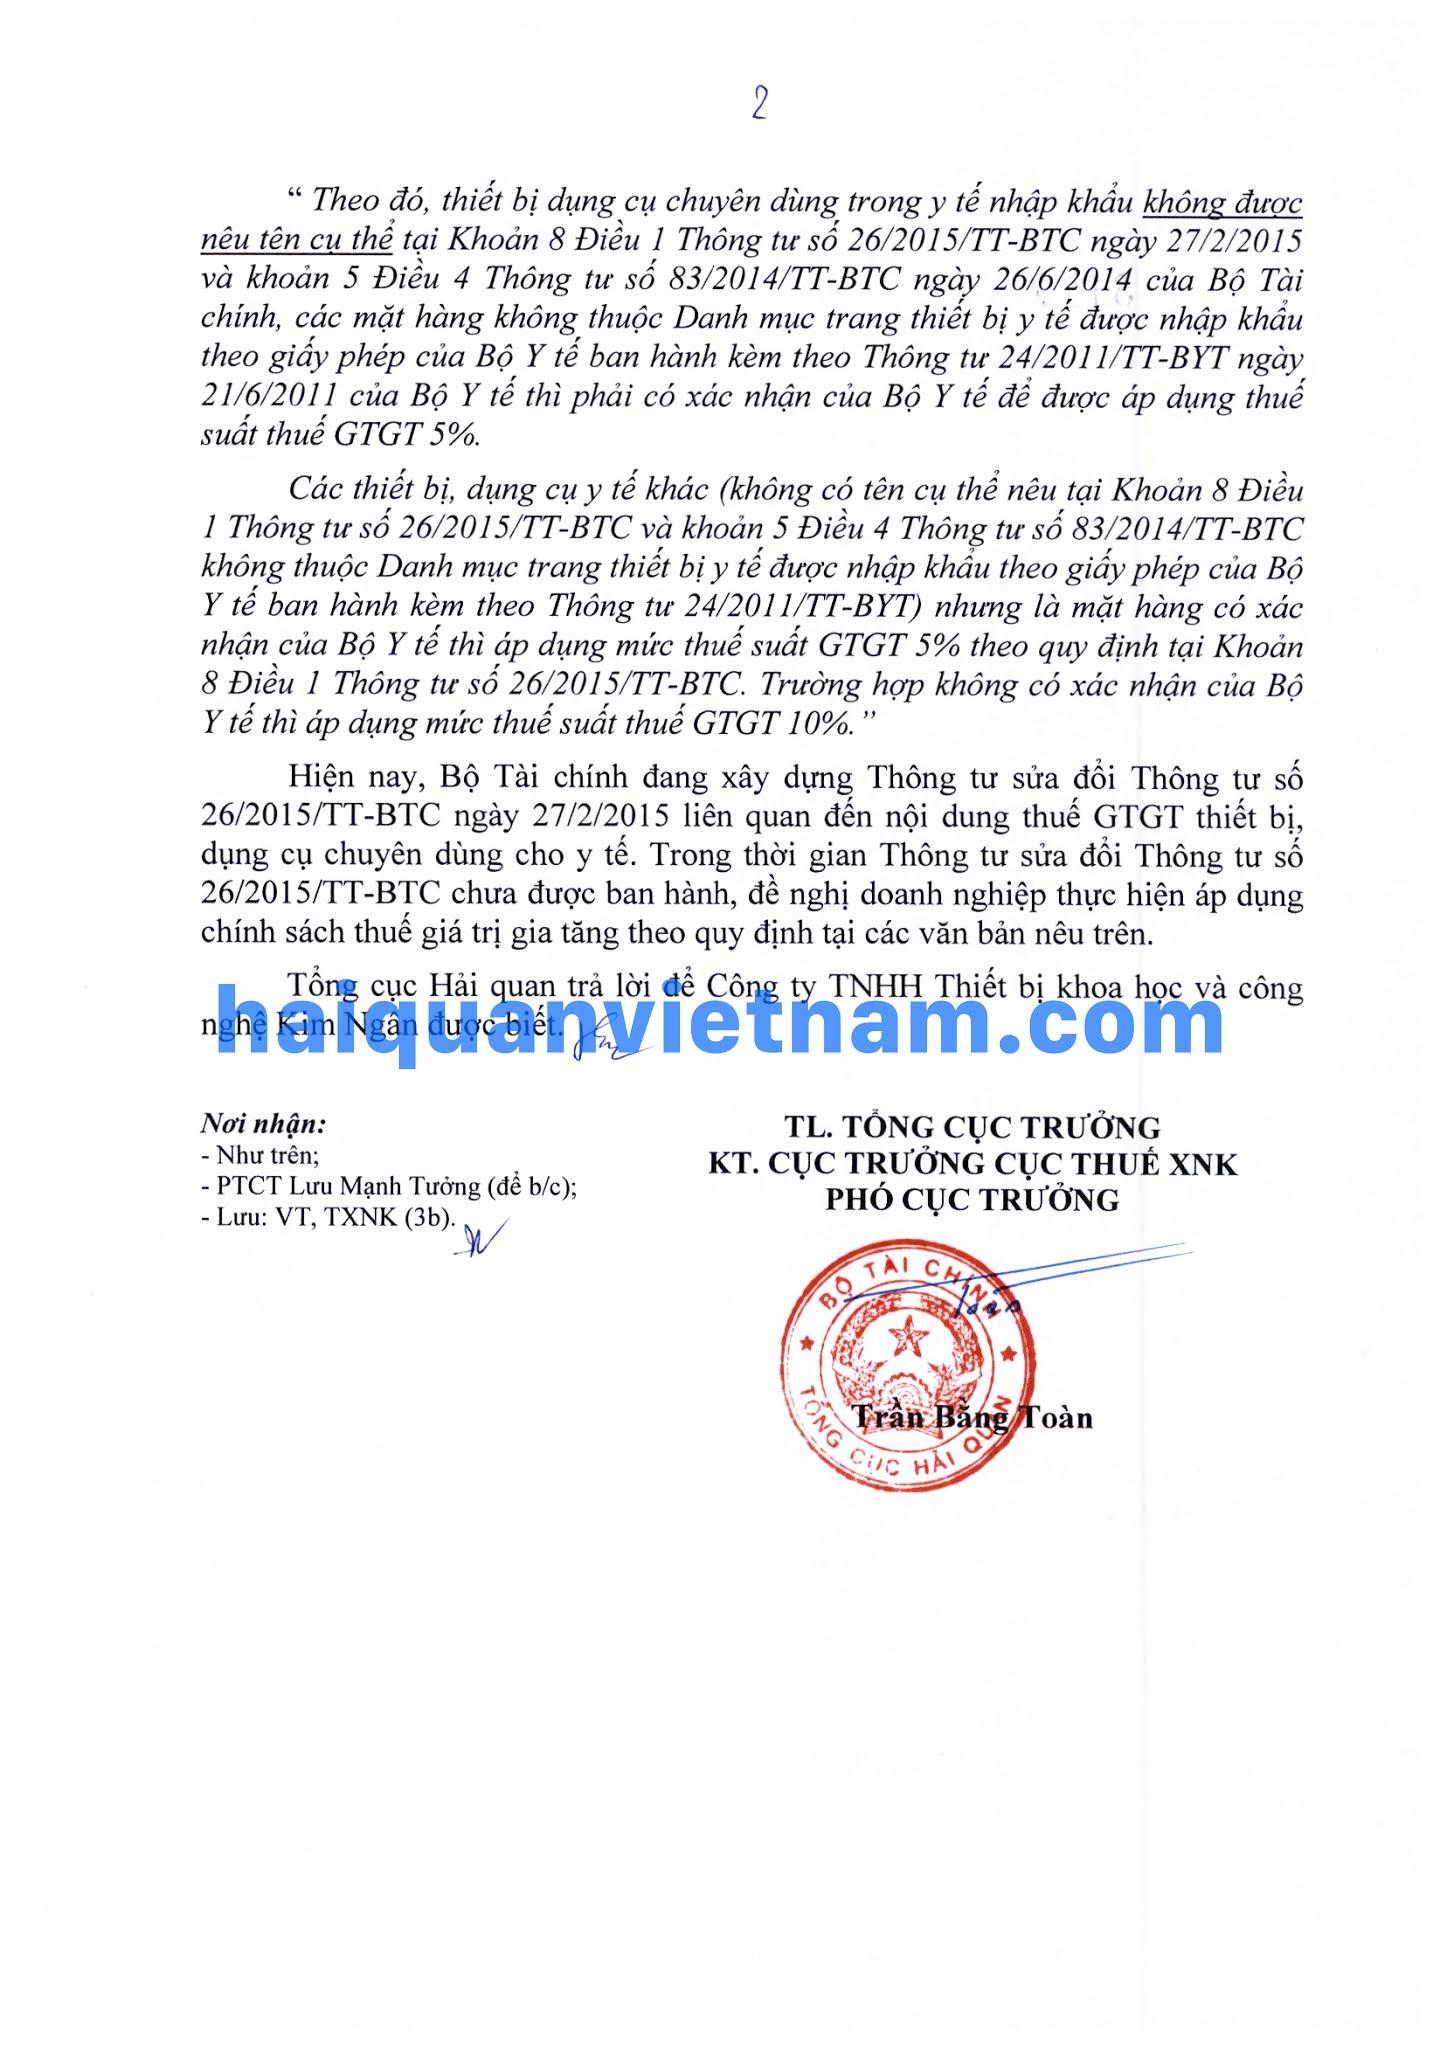 [Image: 210621_3117_TCHQ-TXNK_haiquanvietnam_02.jpg]